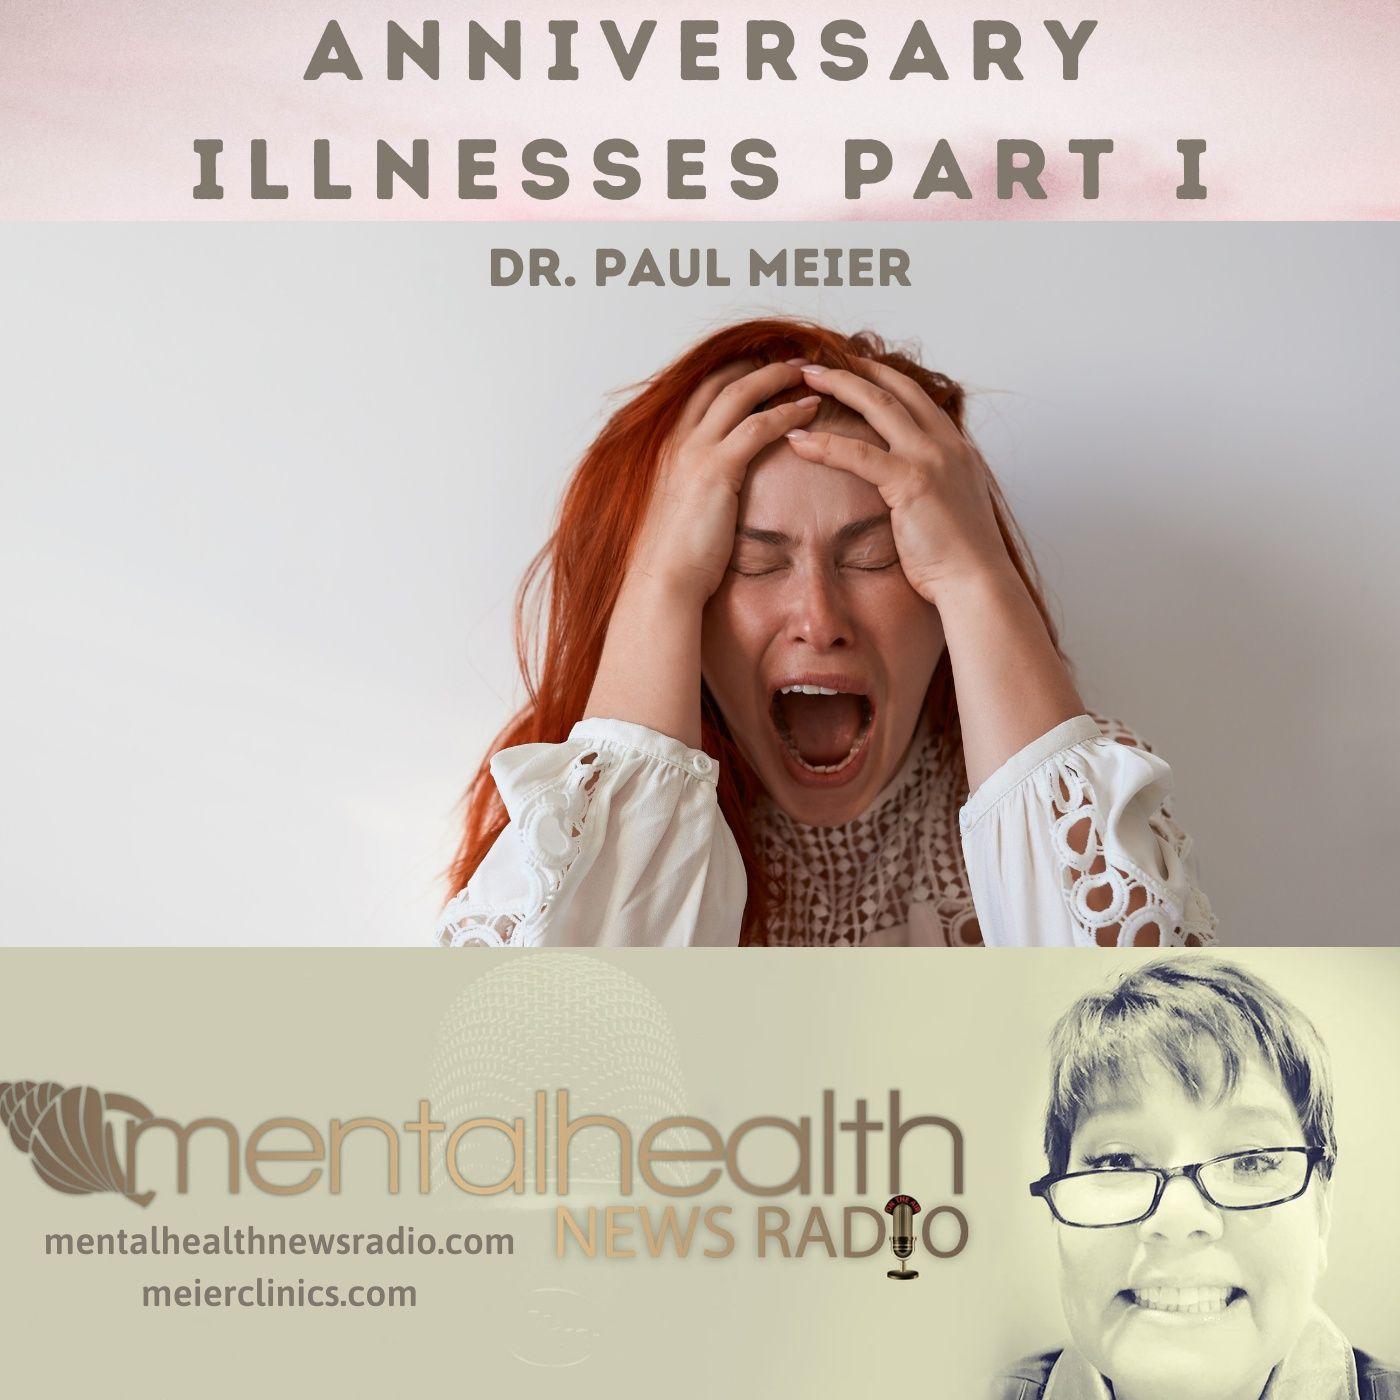 Mental Health News Radio - Dr. Paul Meier: Anniversary Illnesses Part 1